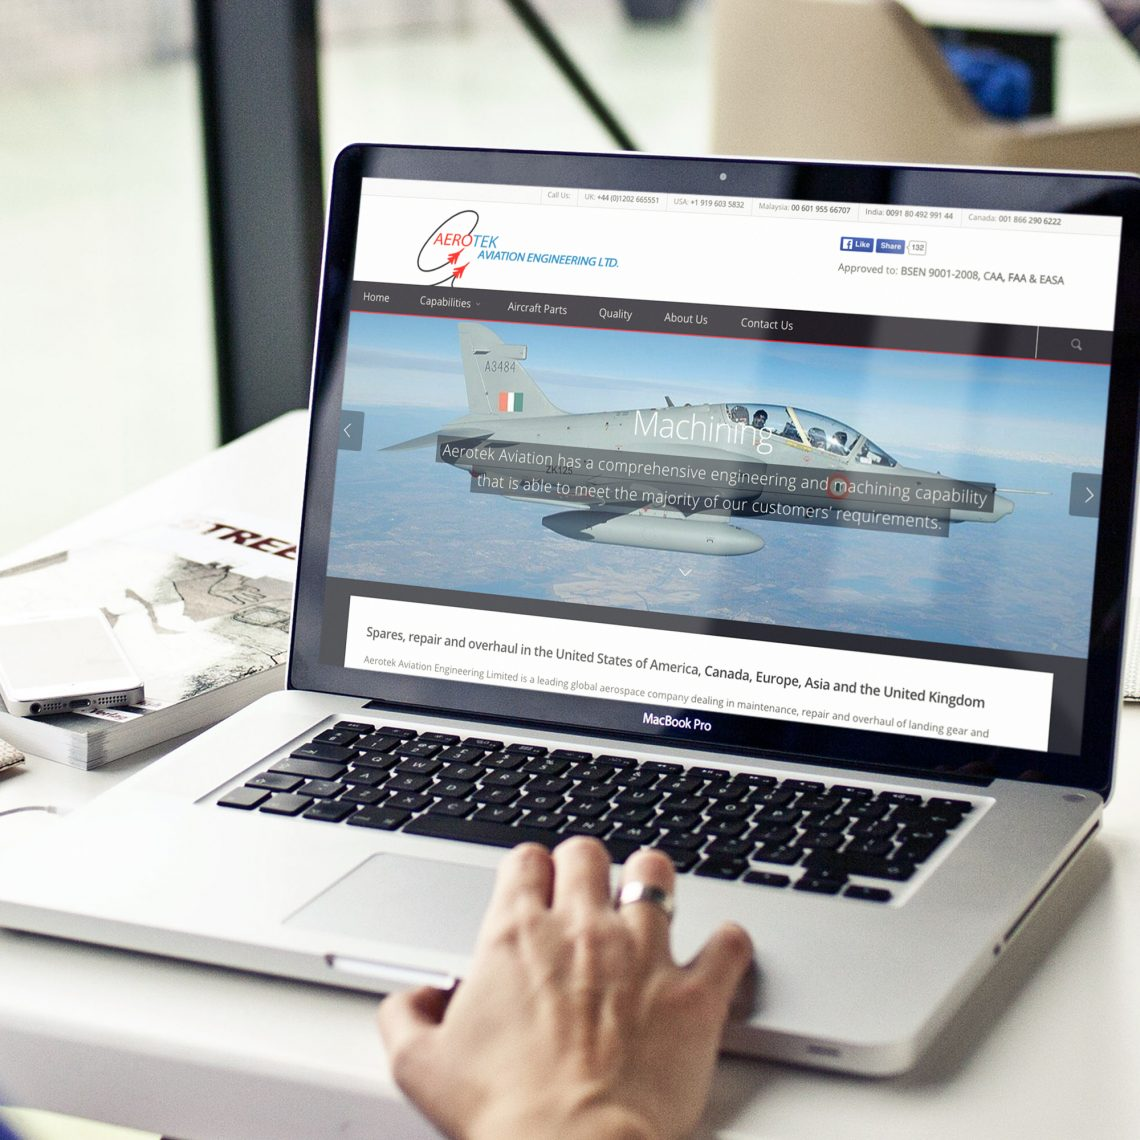 person browsing Aerotek Aviation website